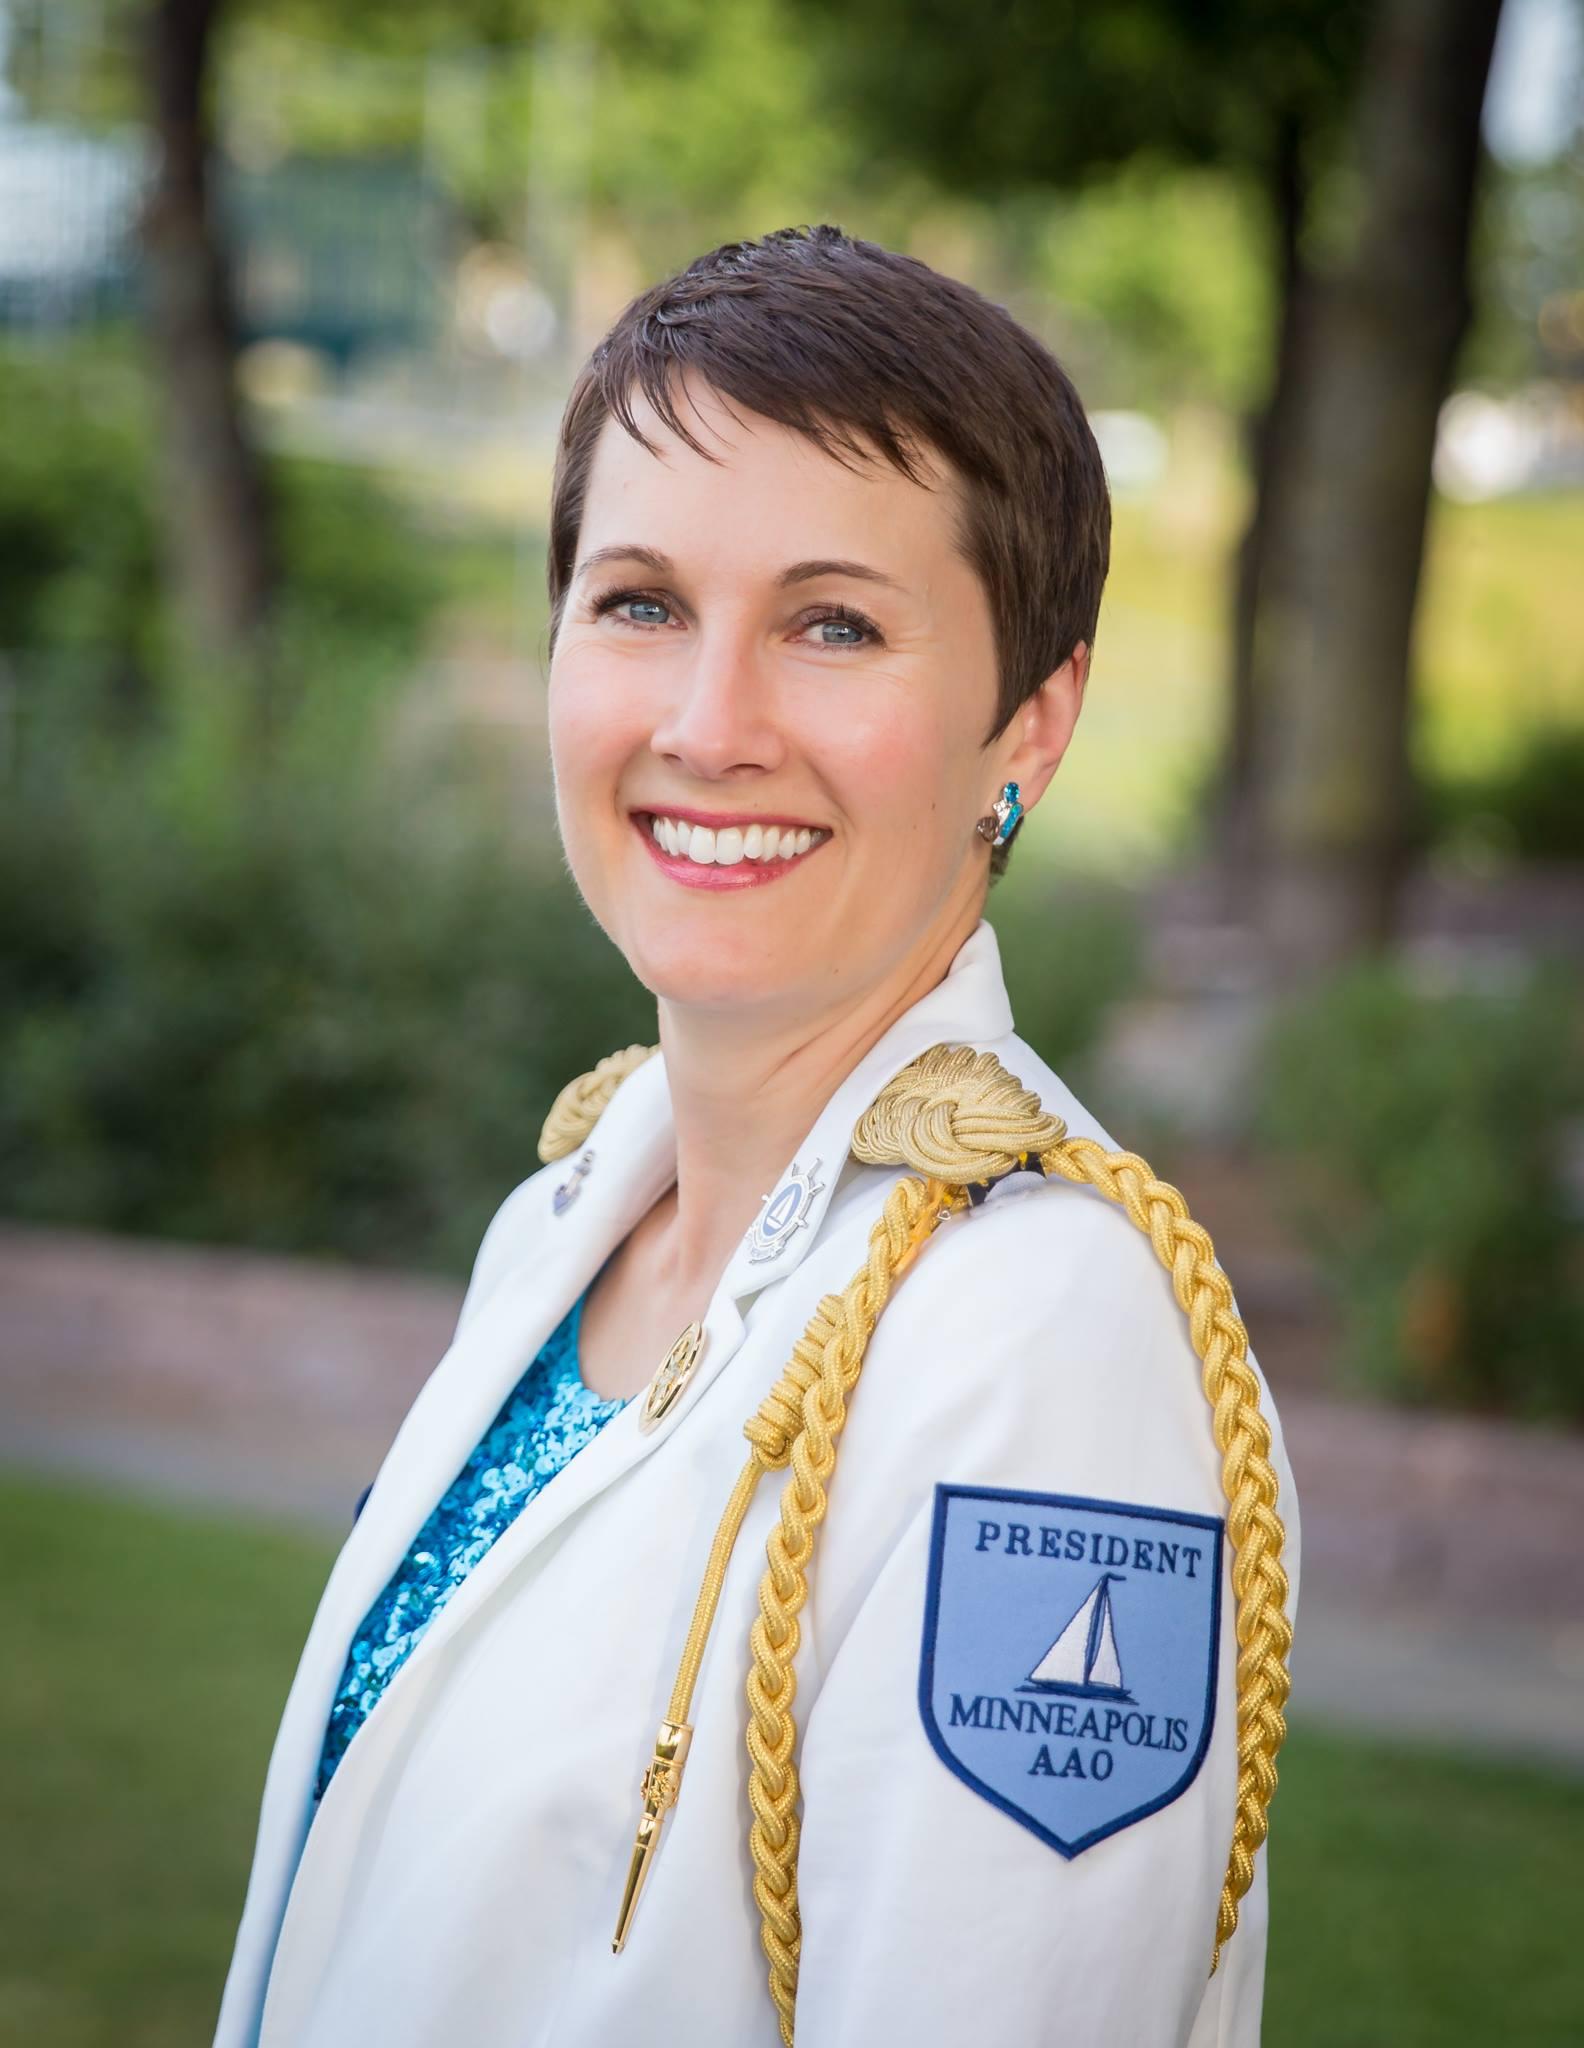 Sarah-Marie-Schrader_AAO-President-2018.